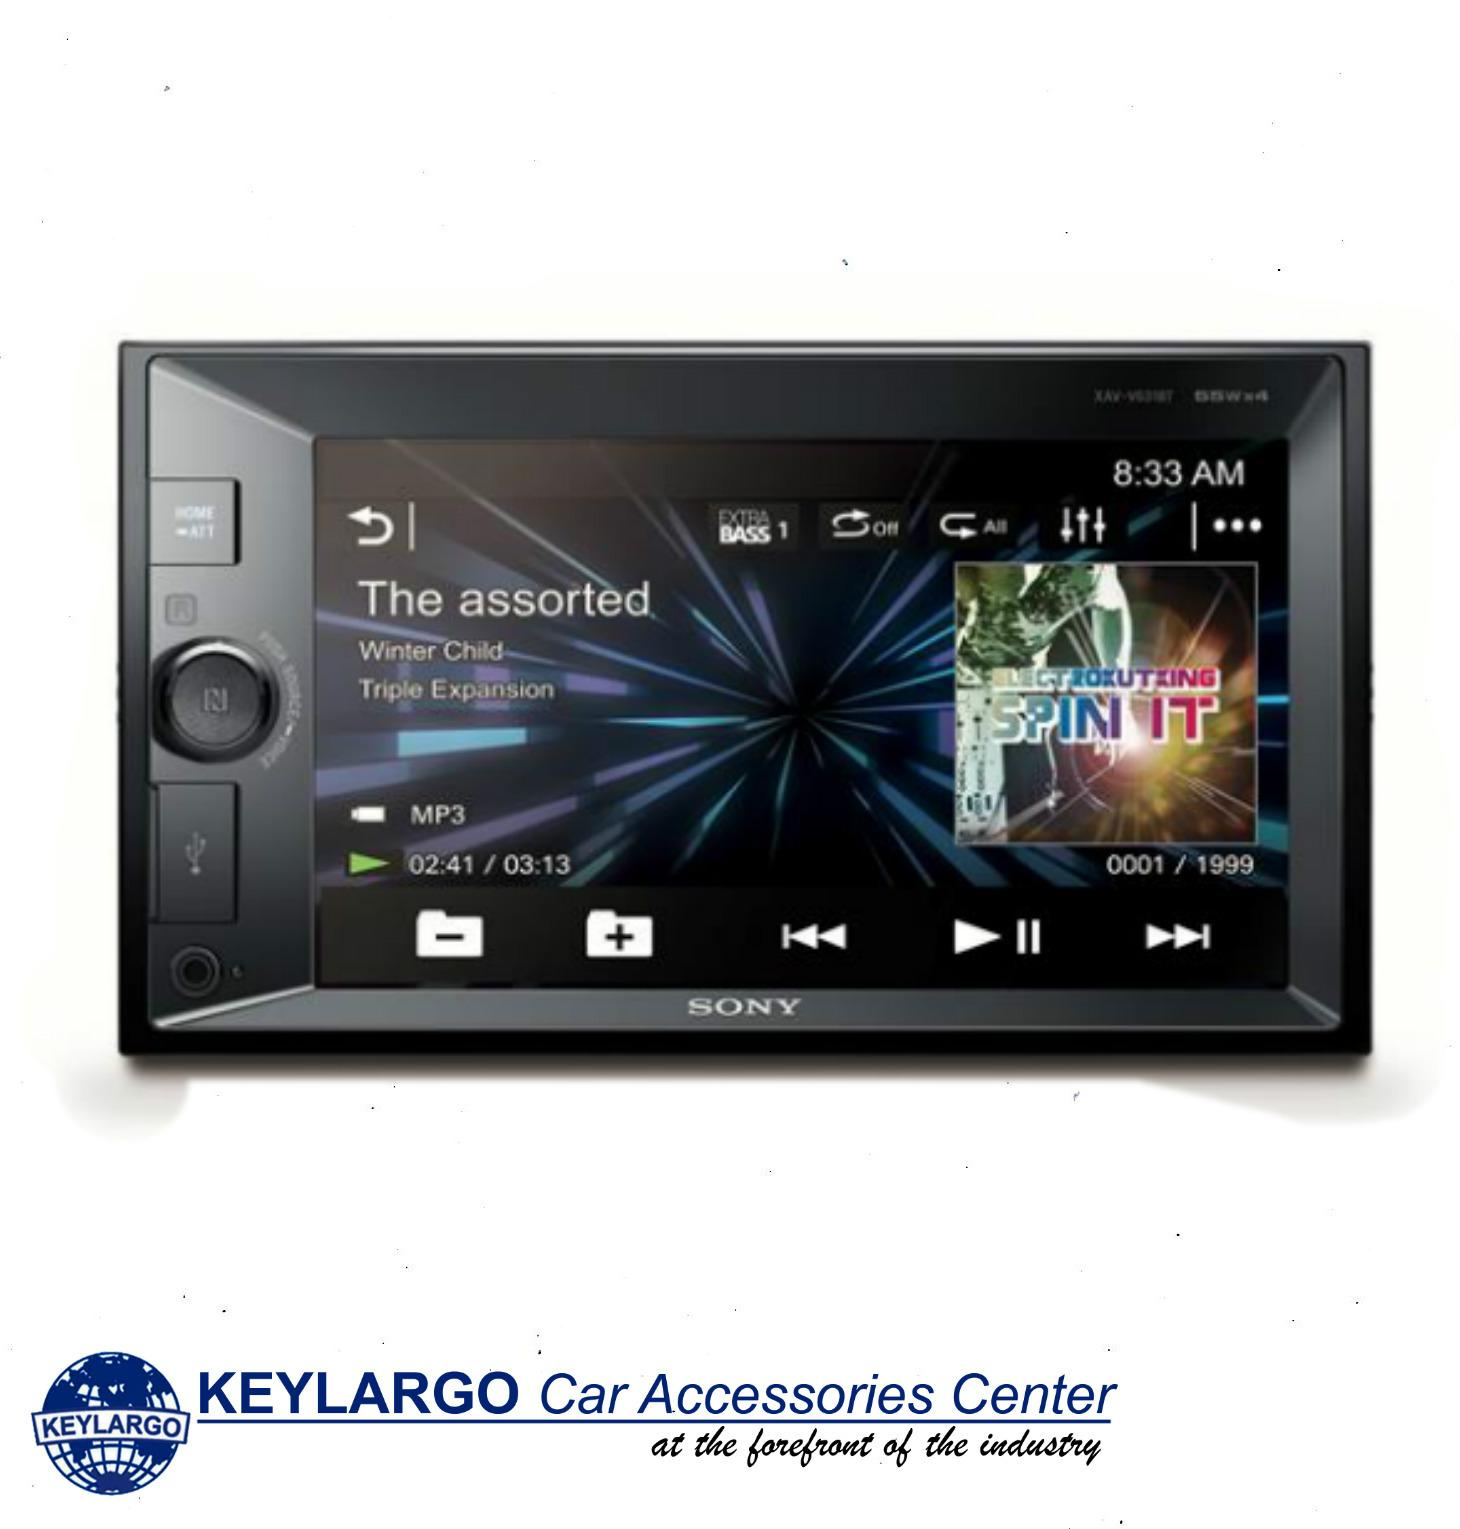 Keylargo SONY XAV-V631BT TOUCH SCREEN MEDIA RECEIVER WITH BLUETOOTH